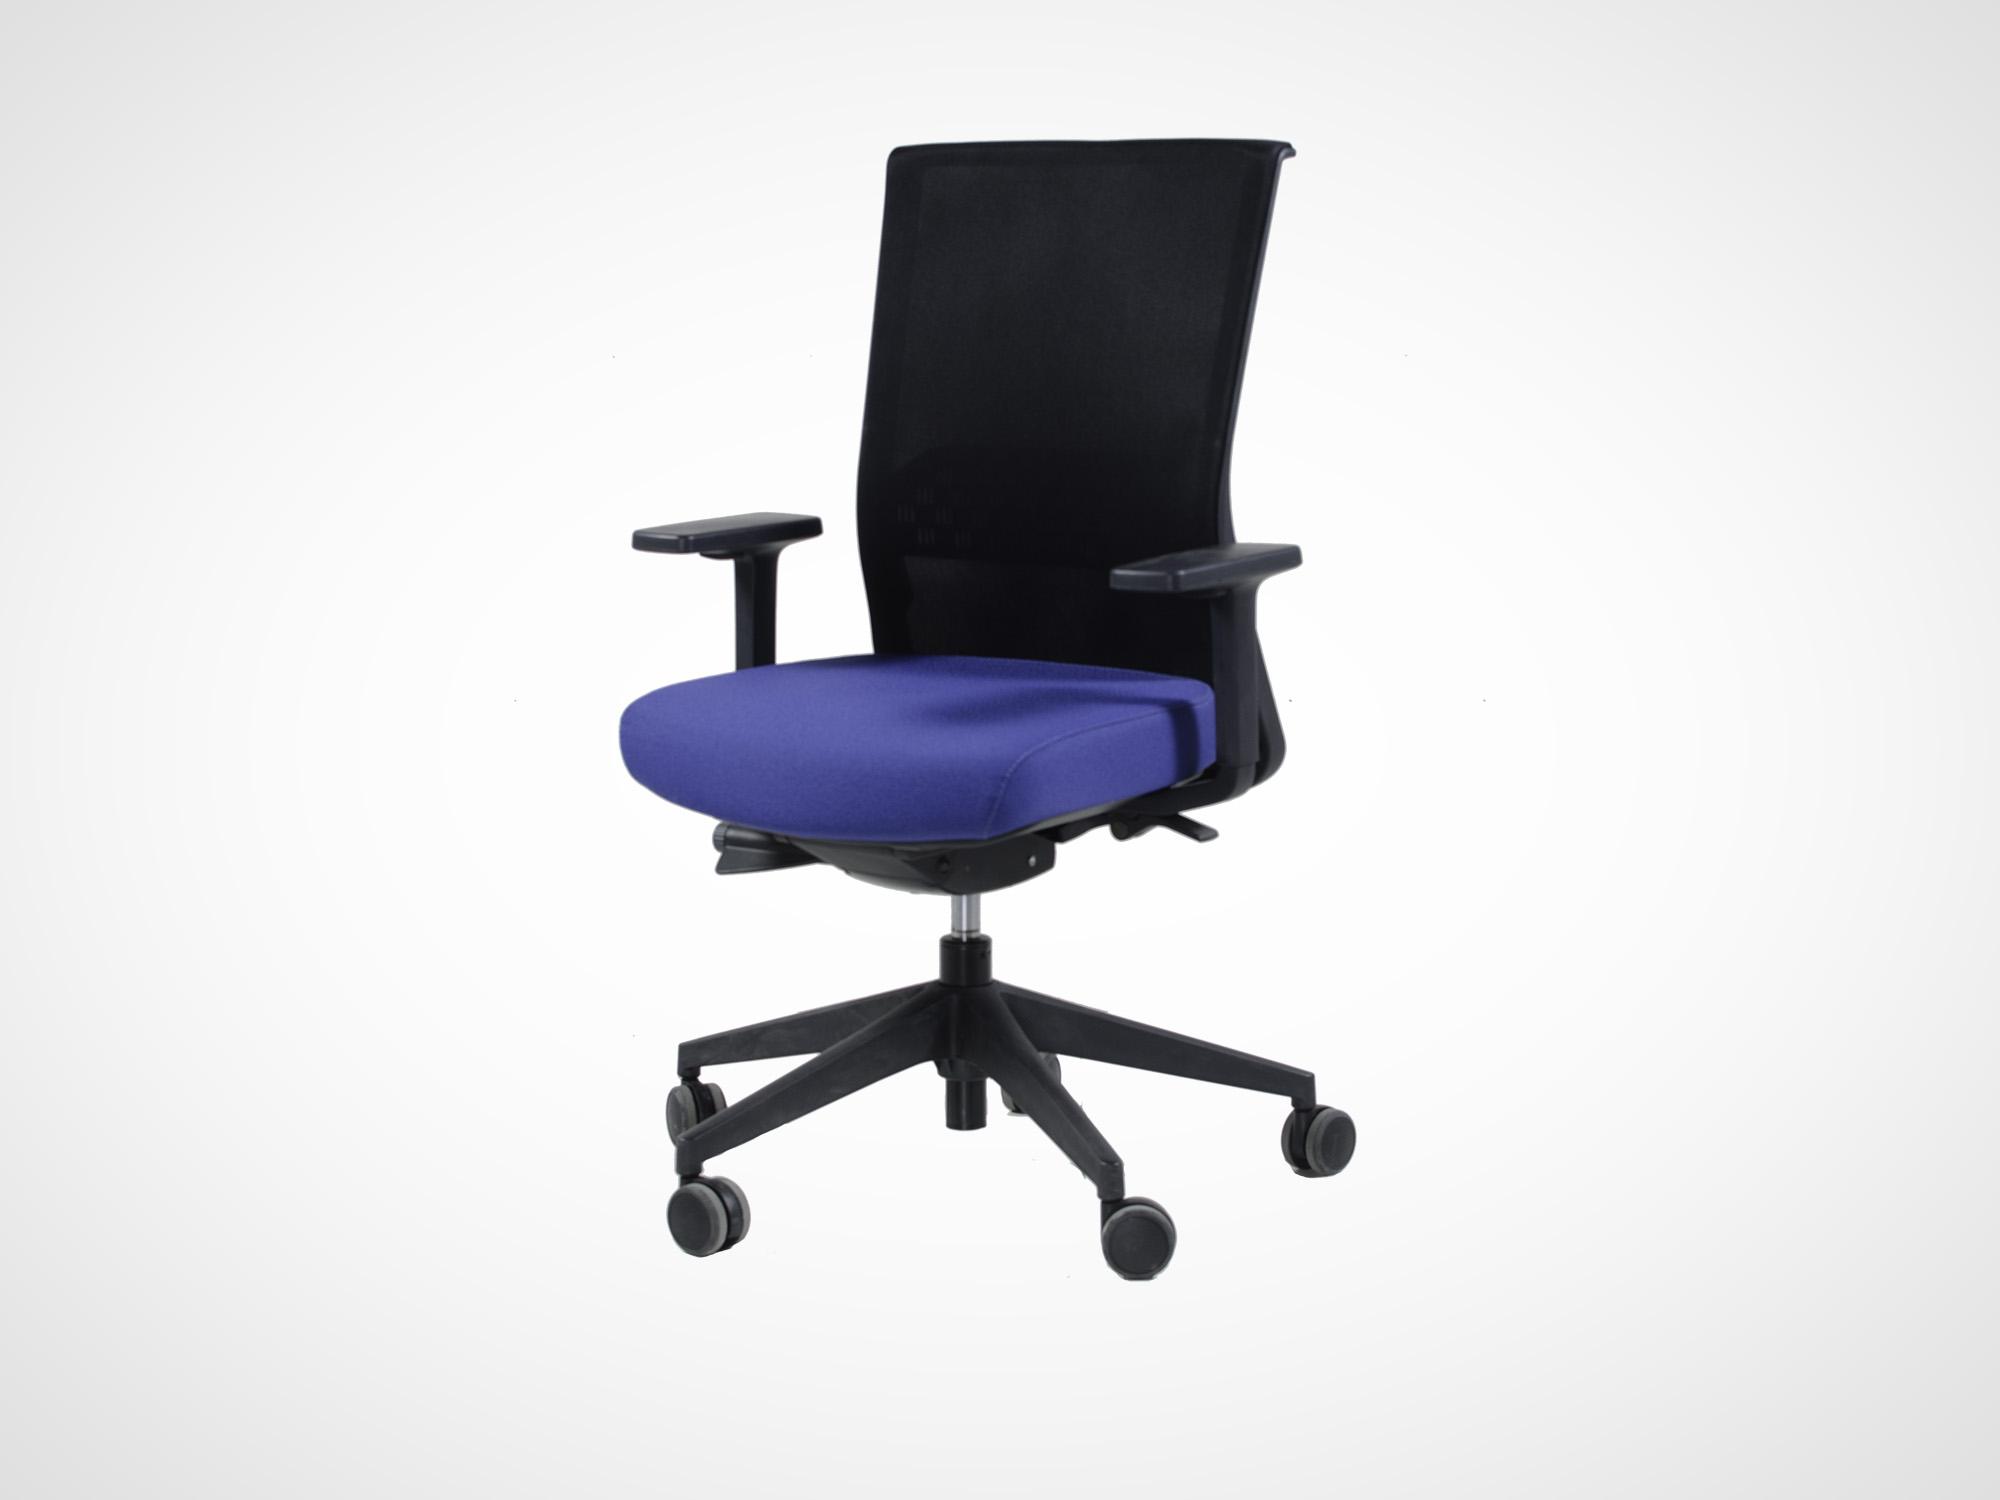 Muebles somomar obtenga ideas dise o de muebles para su for Muebles de oficina ourense